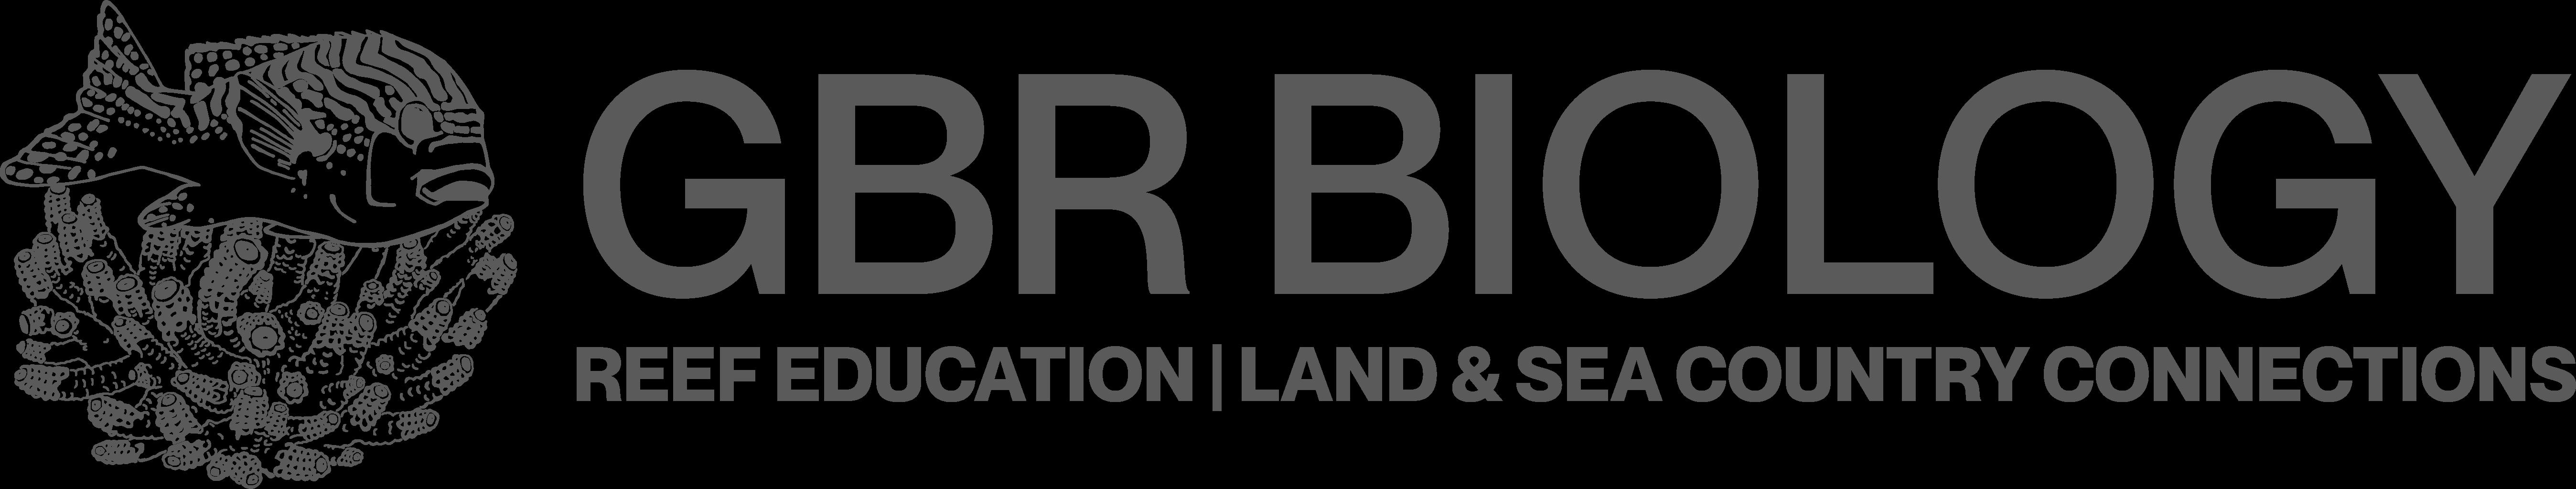 GBR biology logo